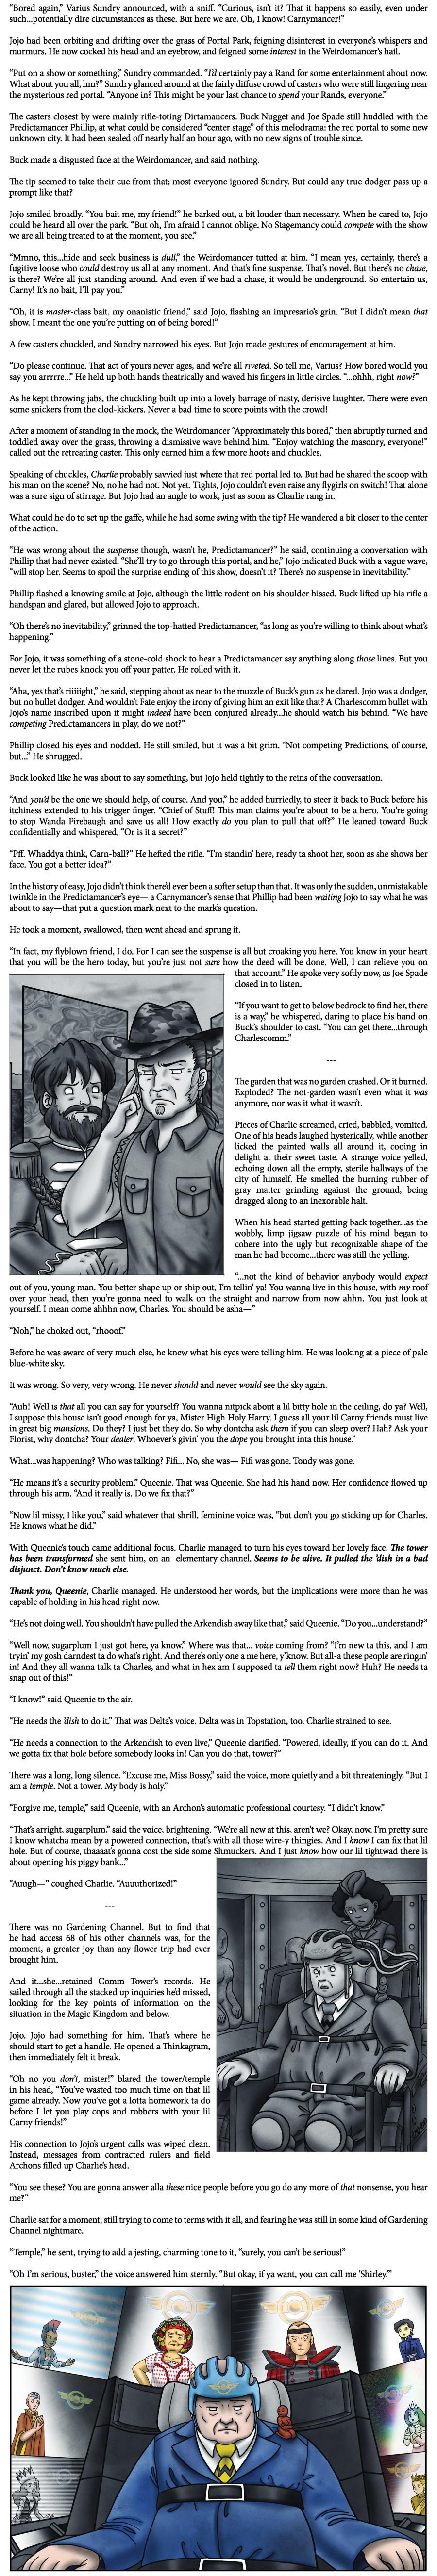 Comic - Book 4 - Page 136